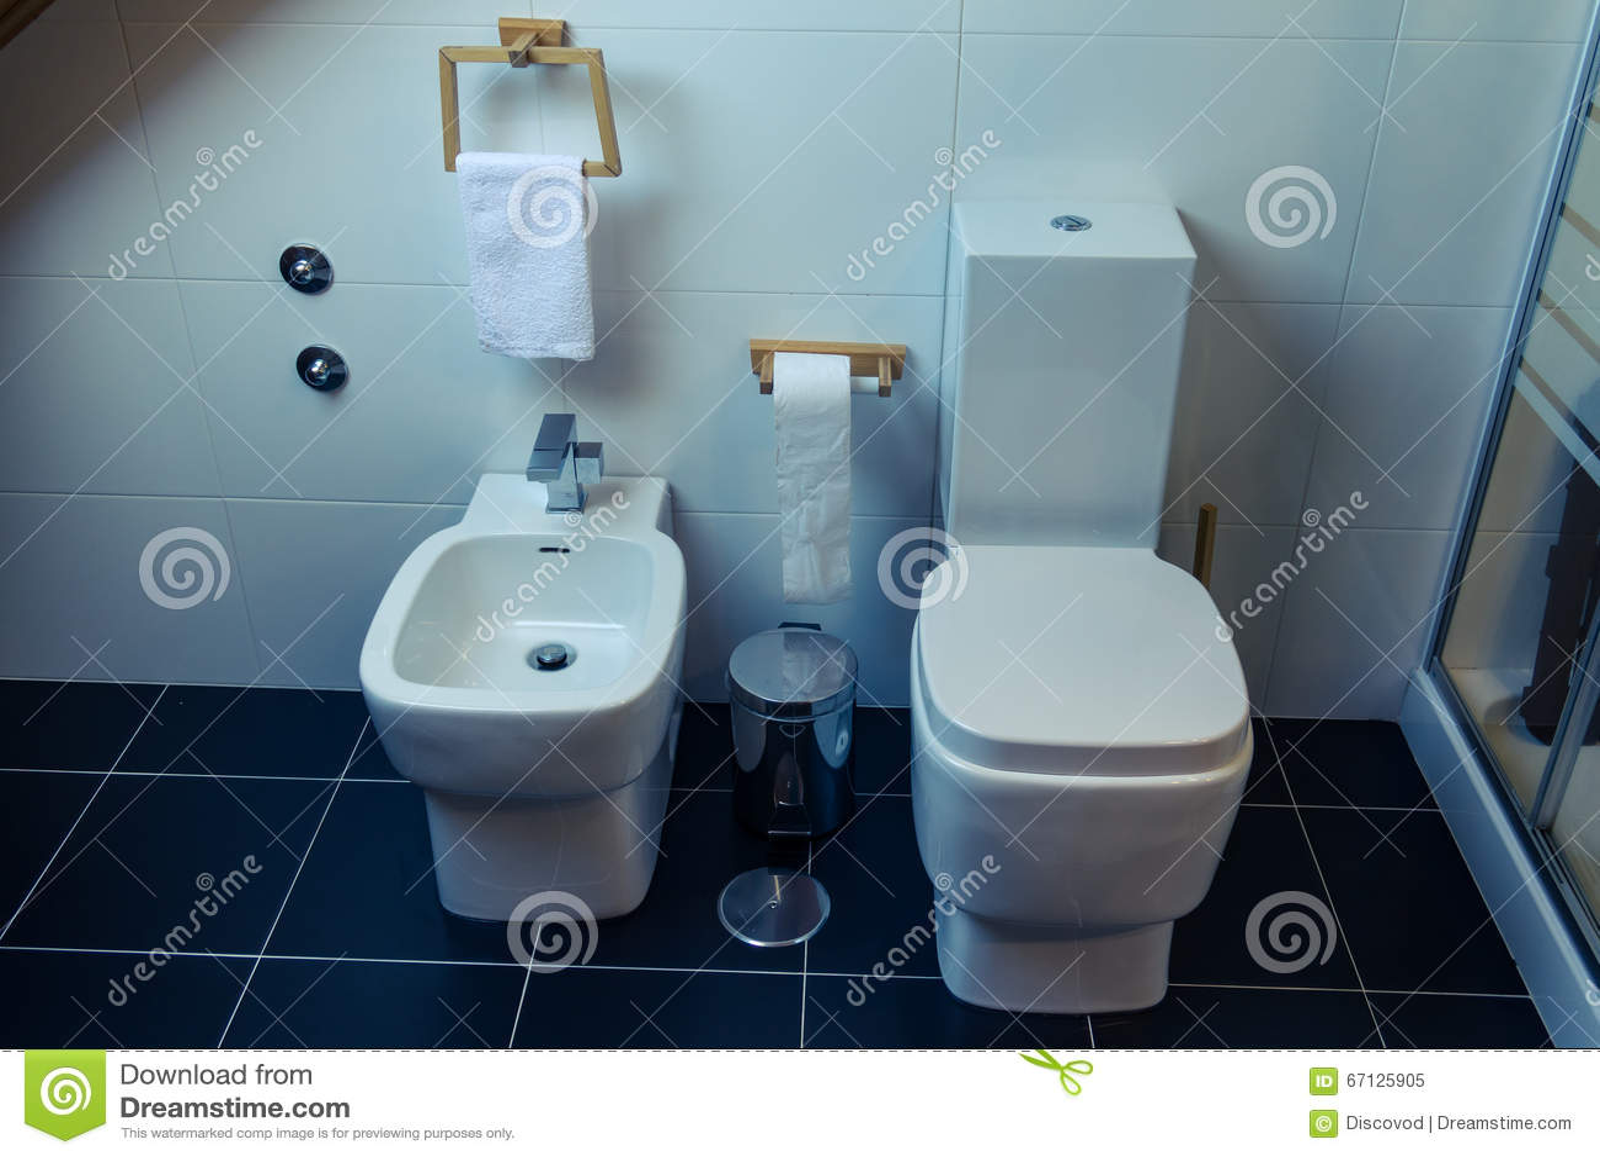 Toalett och bidé i ett modernt badrum arkivfoto   bild: 67125905